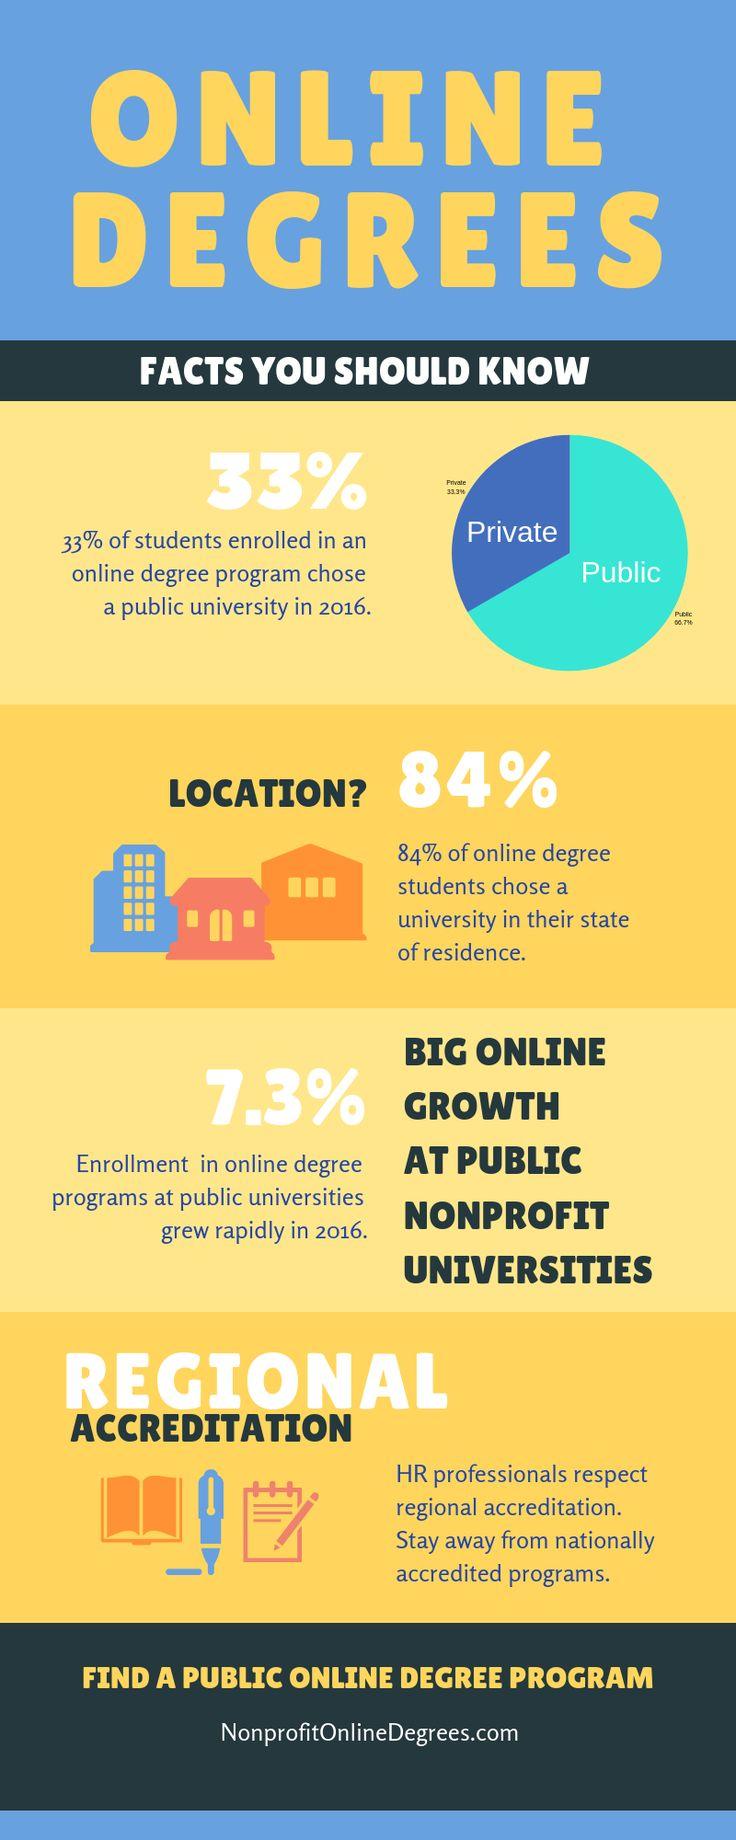 Online Enrollment at Public Nonprofit Colleges and Universities Outpaces For-Profits